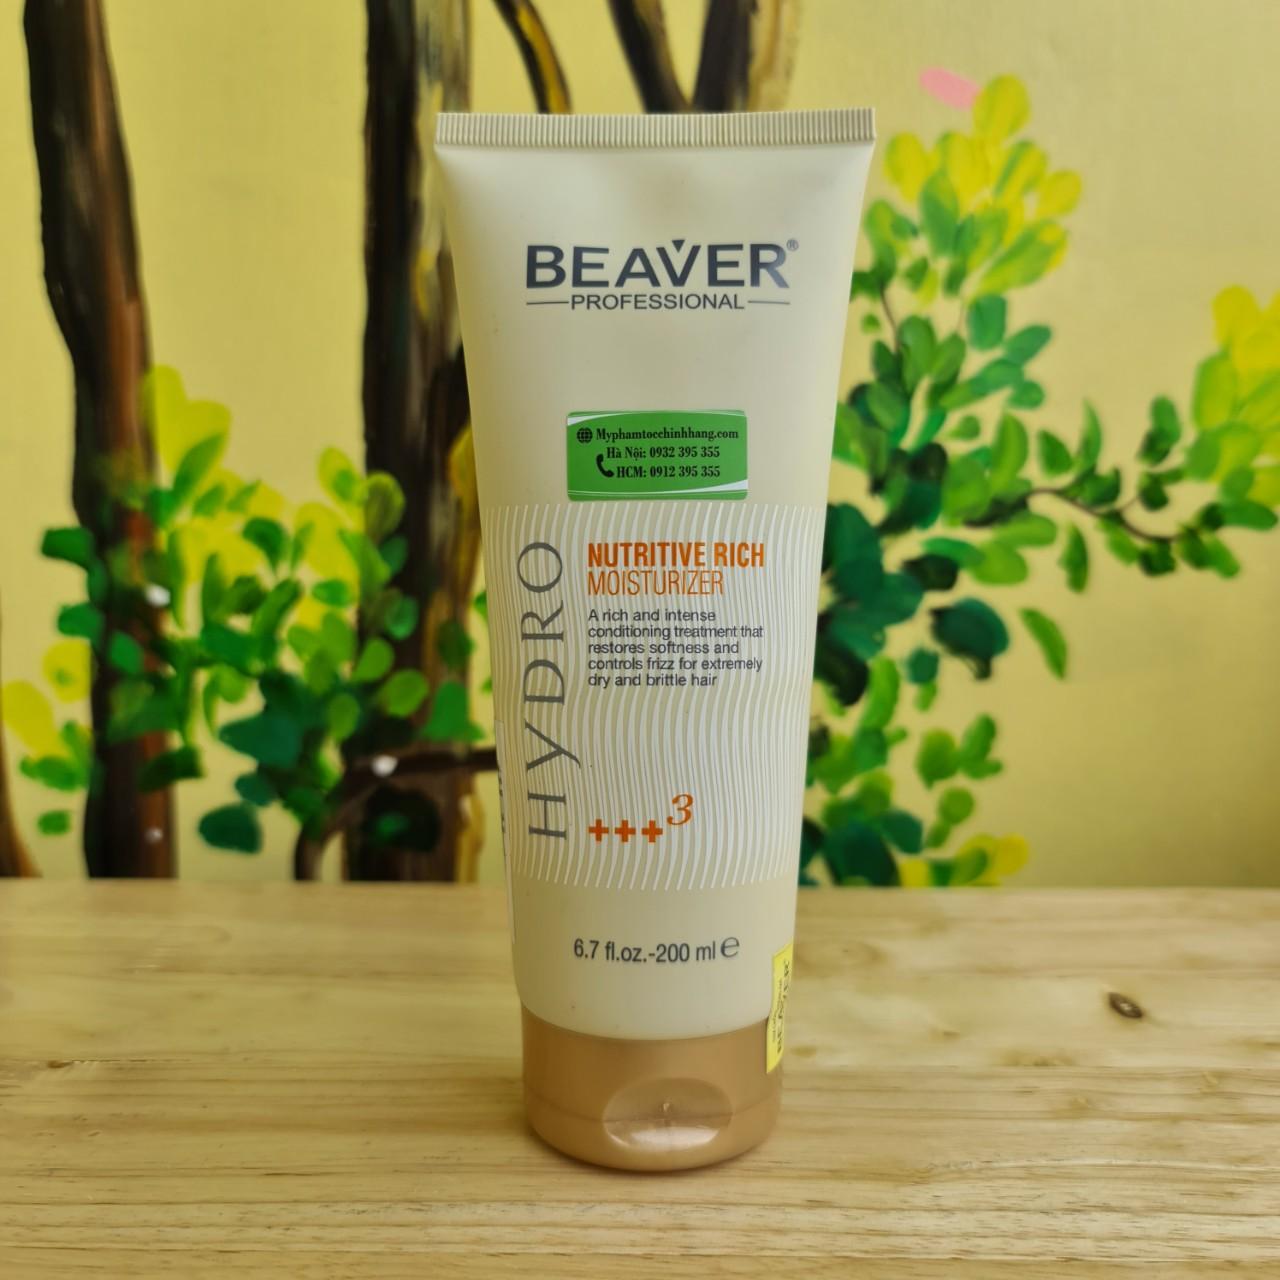 Beaver Hydro Nutritive Rich Moisturizer +++3 200ml